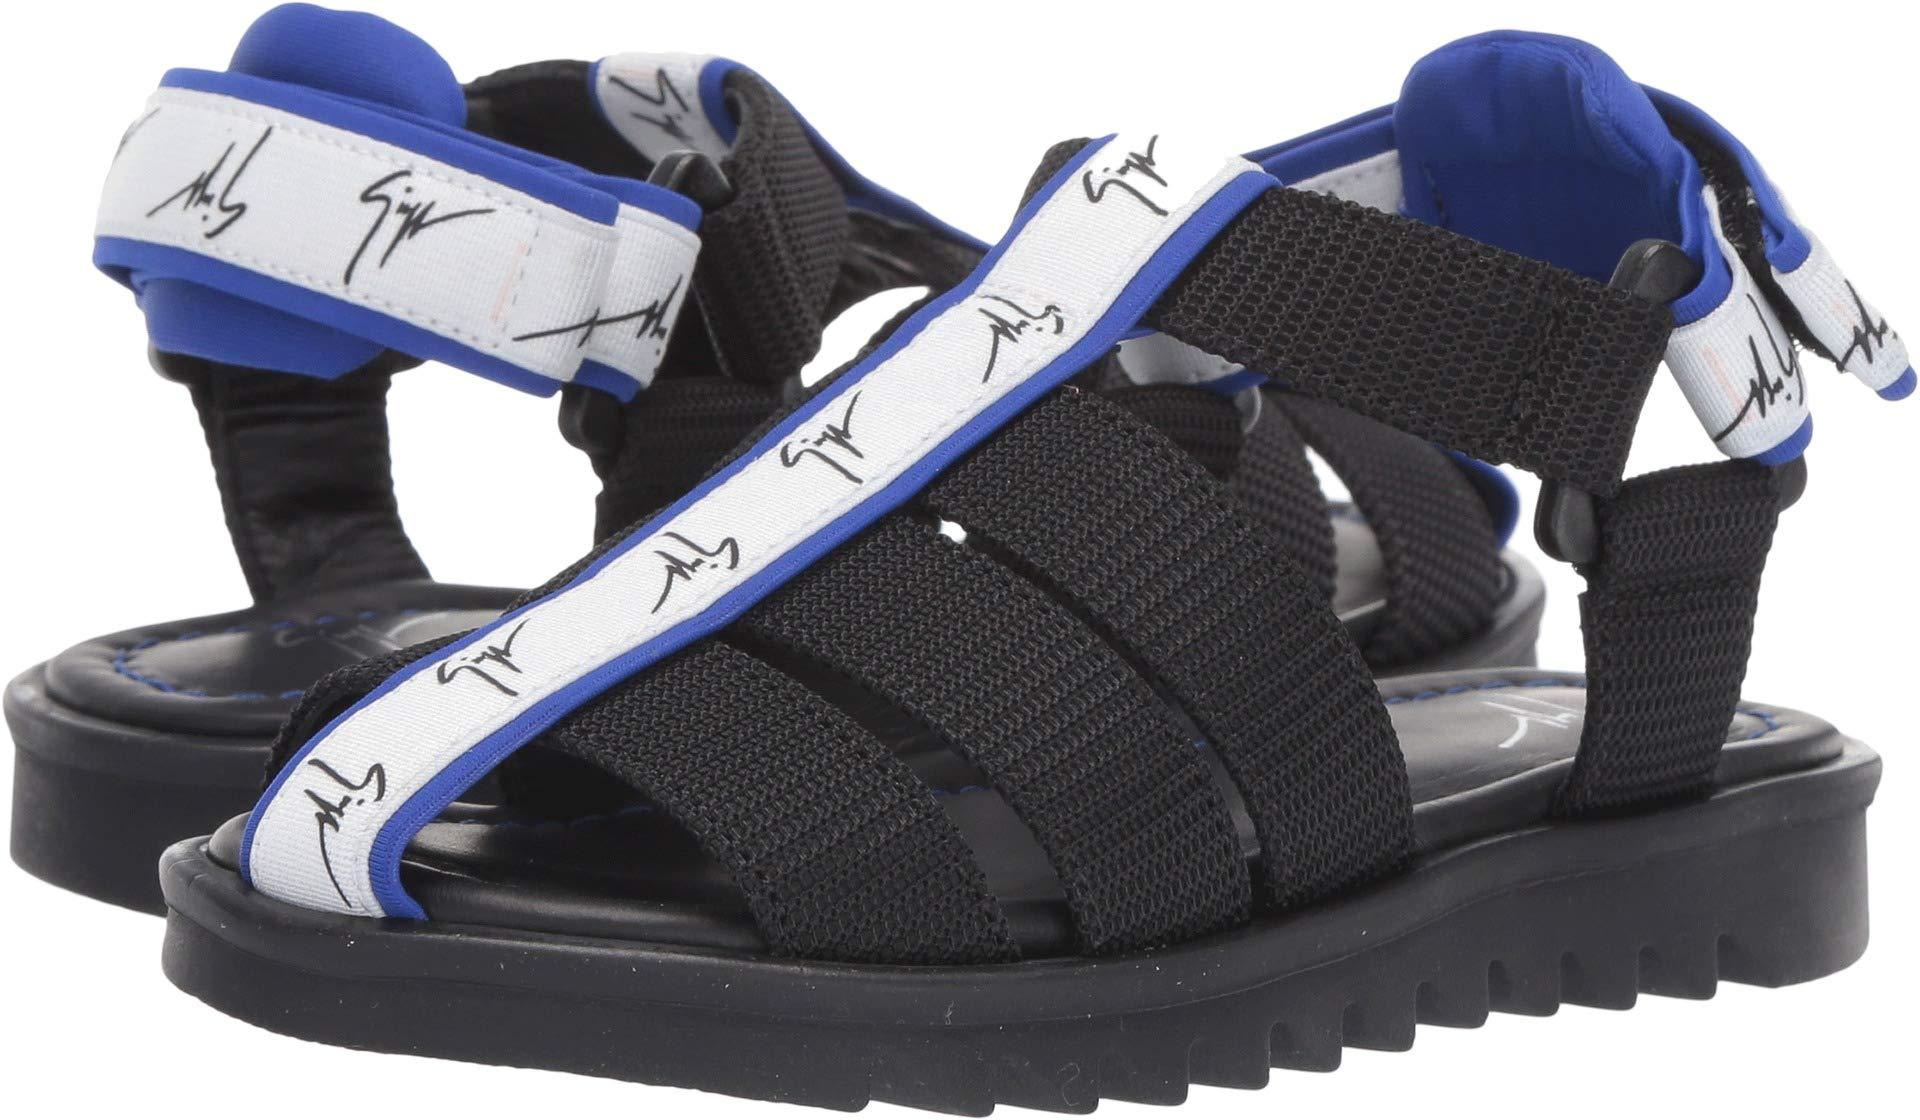 Giuseppe Zanotti Kids Unisex Bond Gomma Strap Sandals (Toddler/Little Kid) Black/Blue 33 M EU